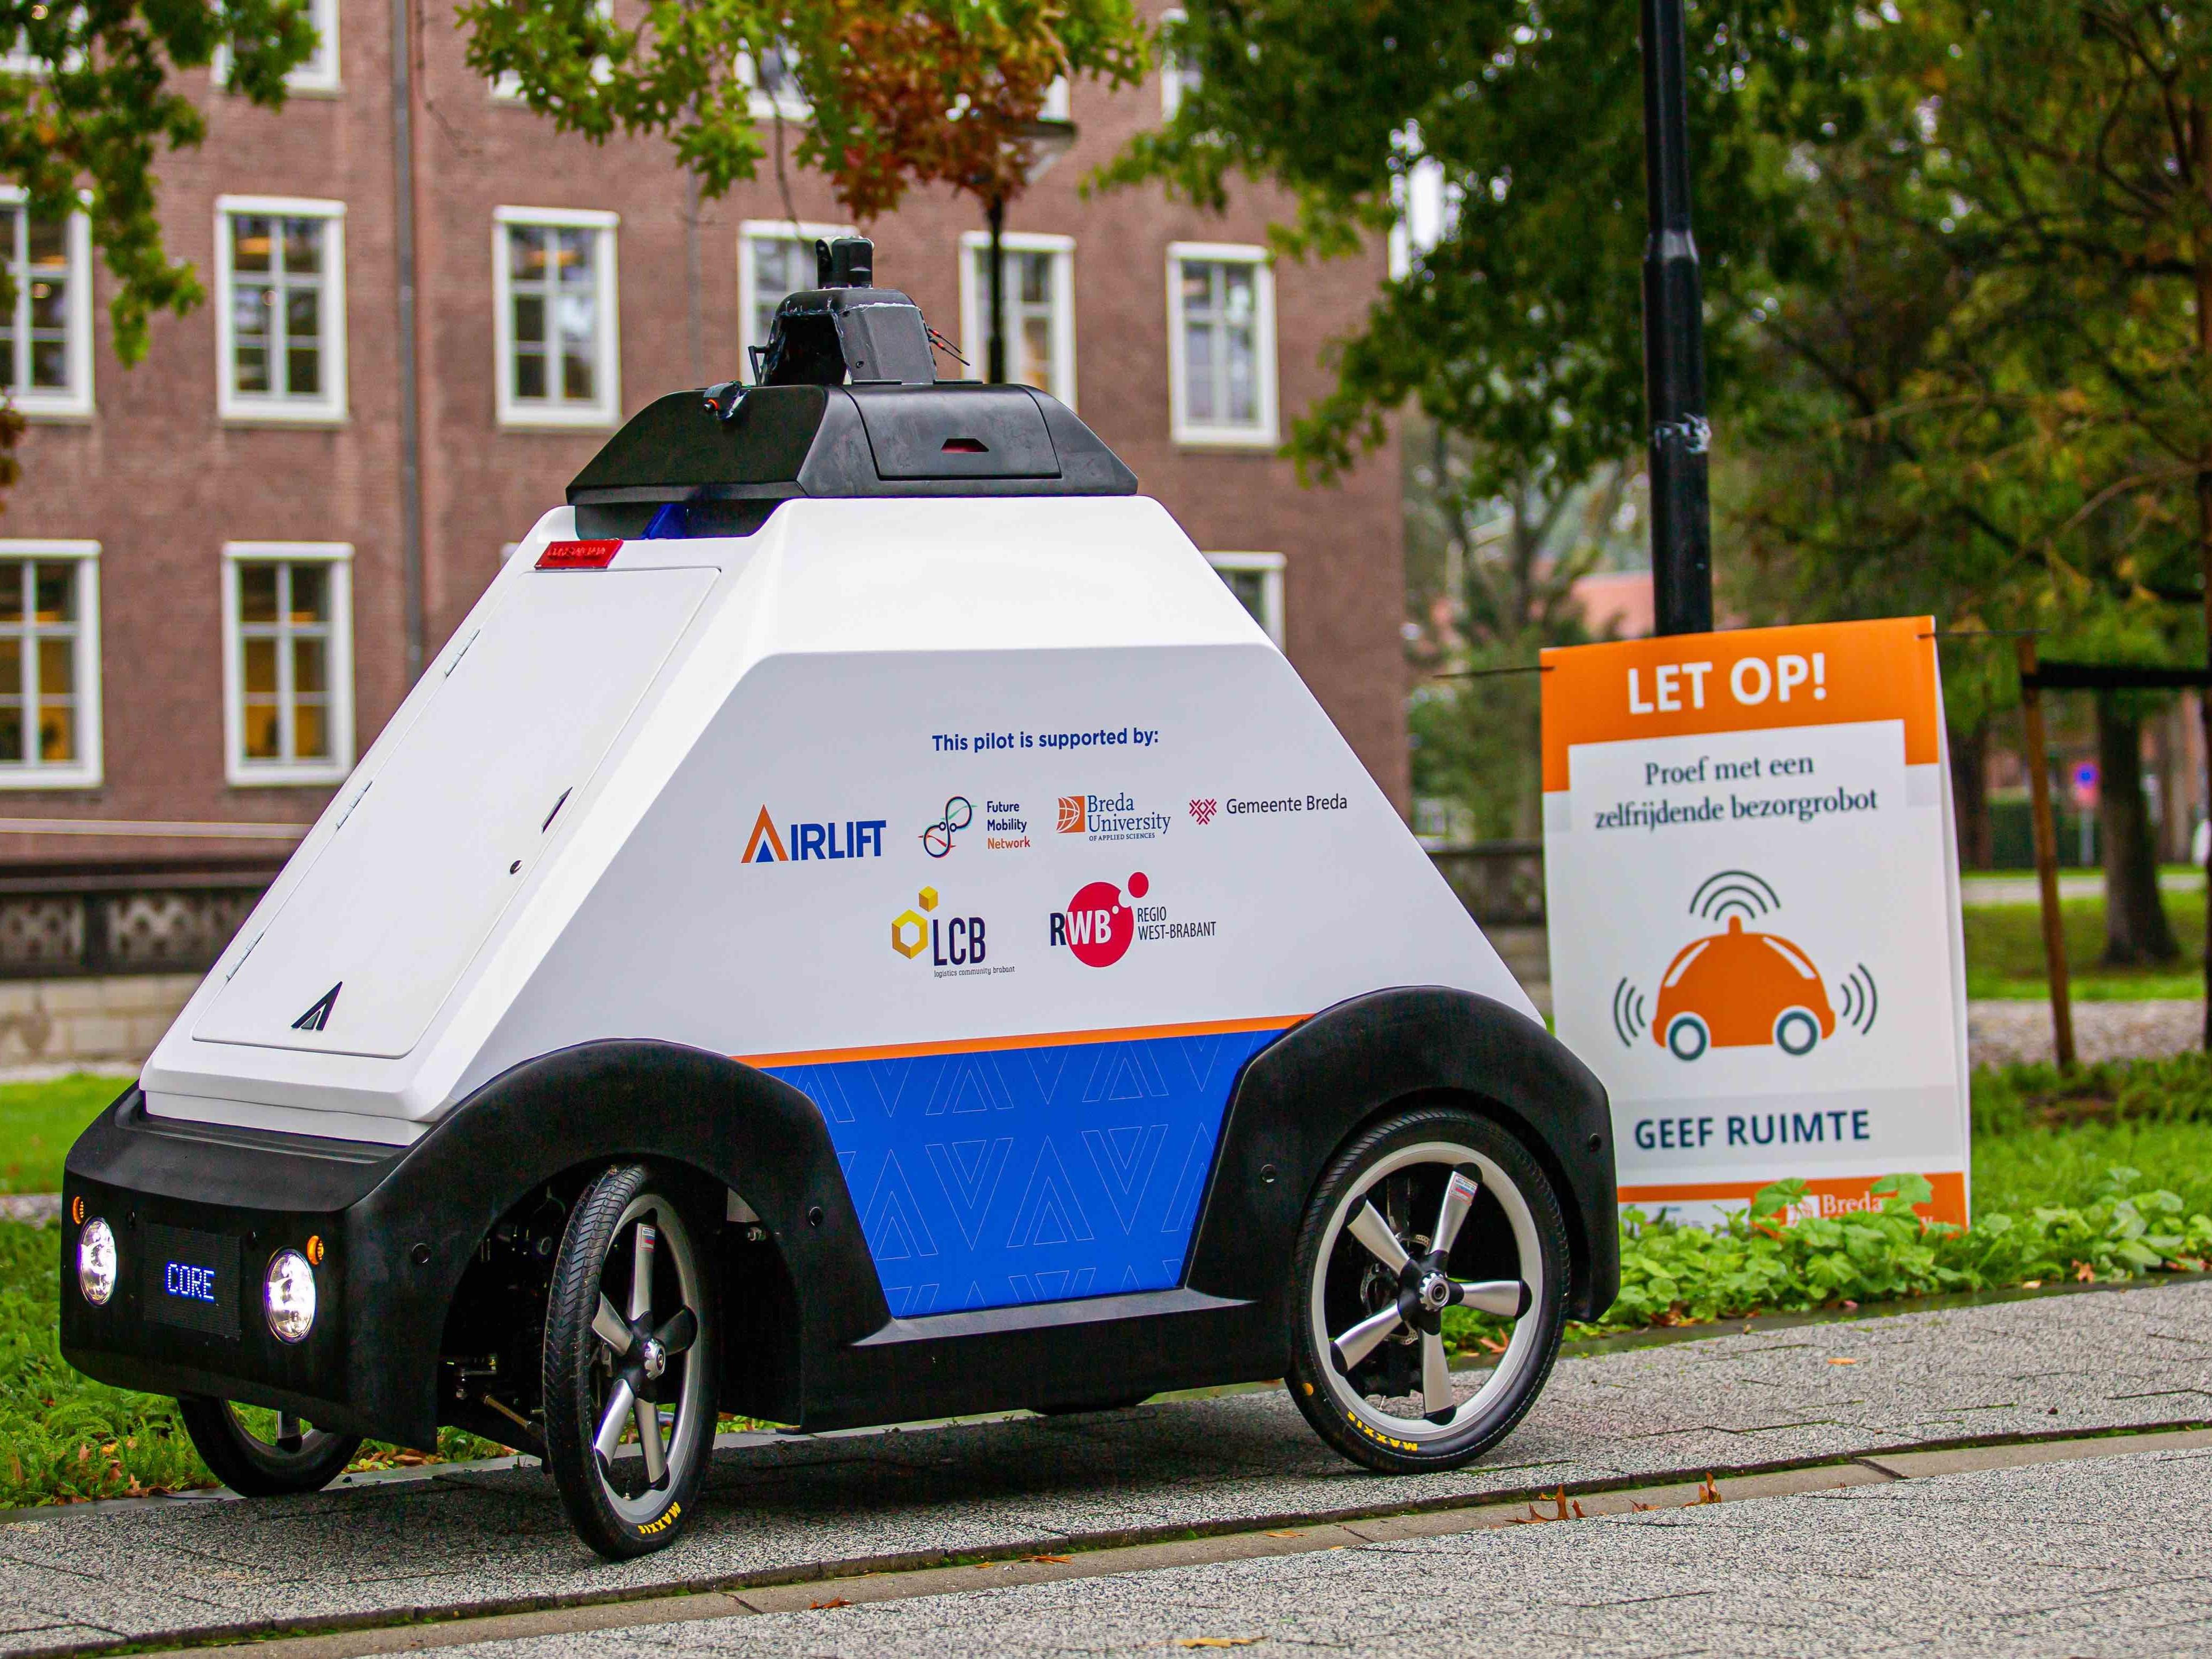 Breda University of Applied Sciences introduceert autonome bezorgrobot op campus